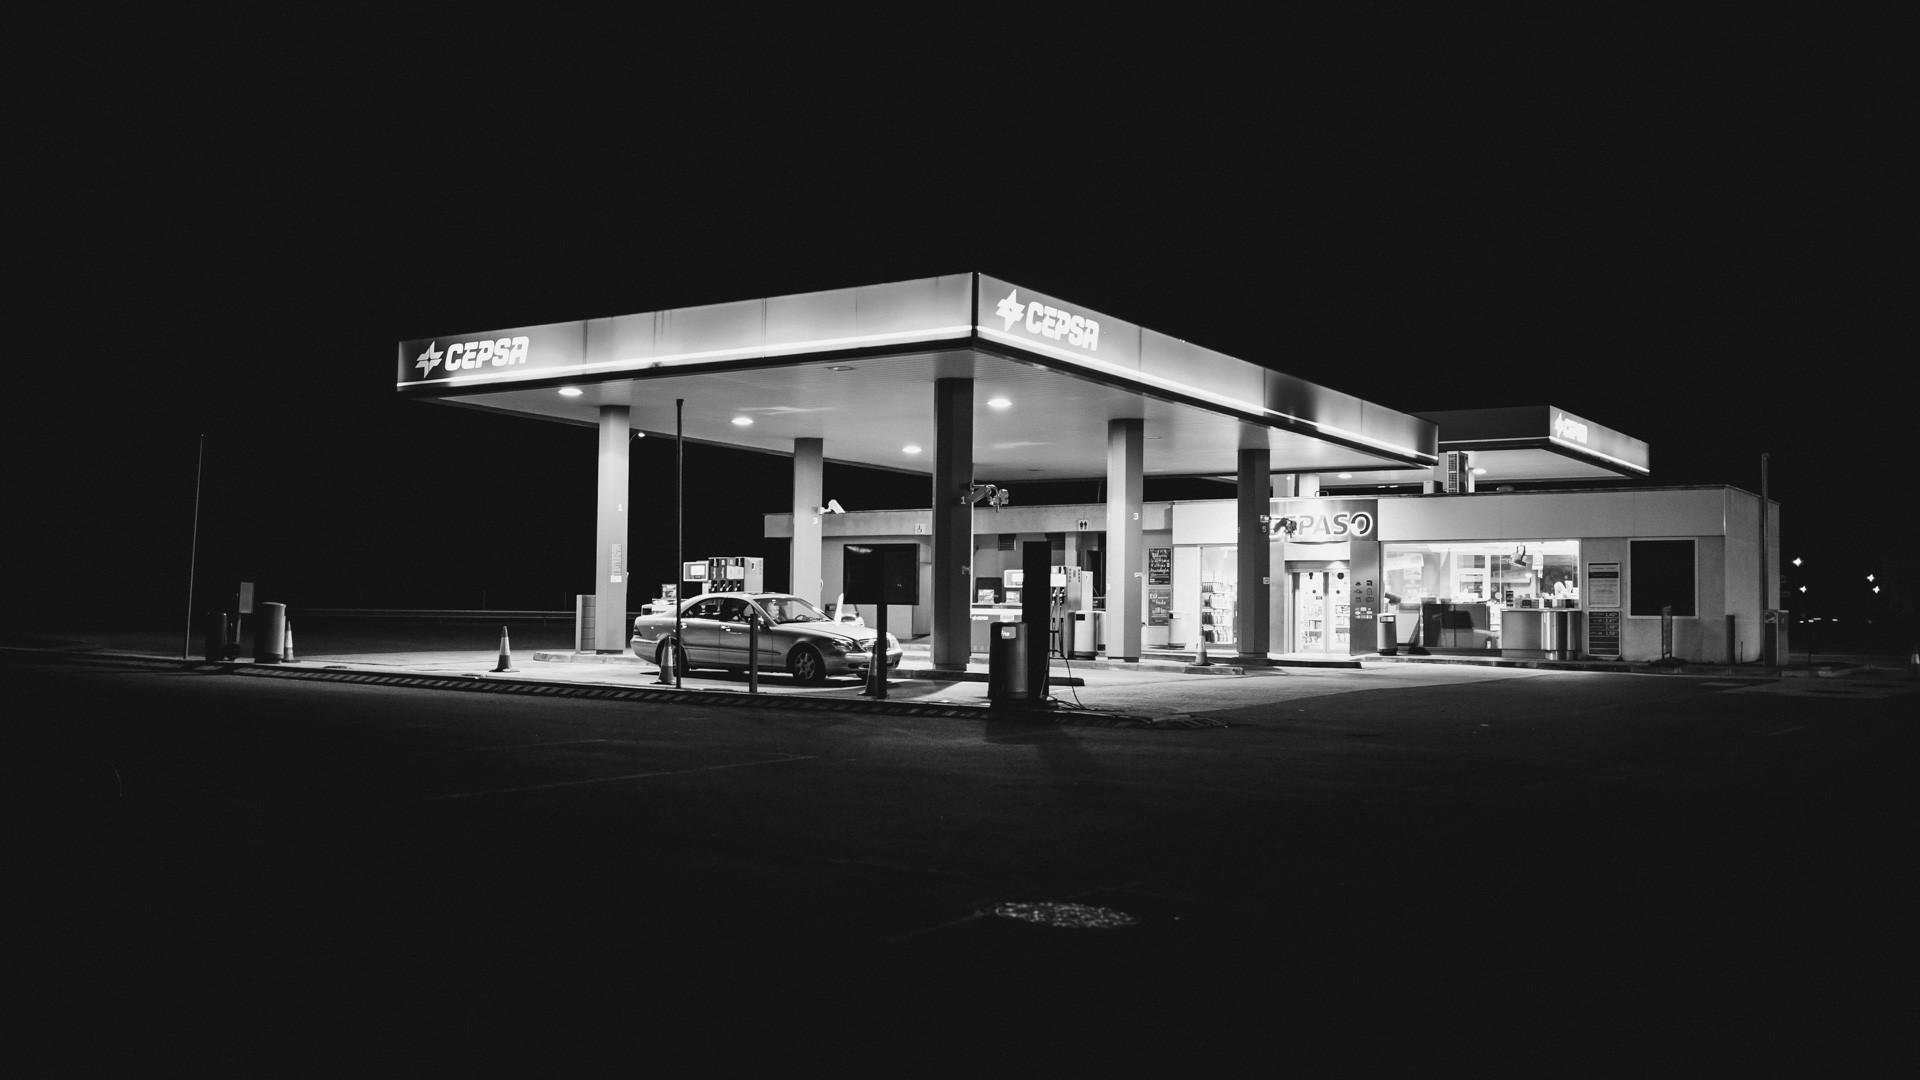 Damien-Dohmen-Photographe-Madrid-1